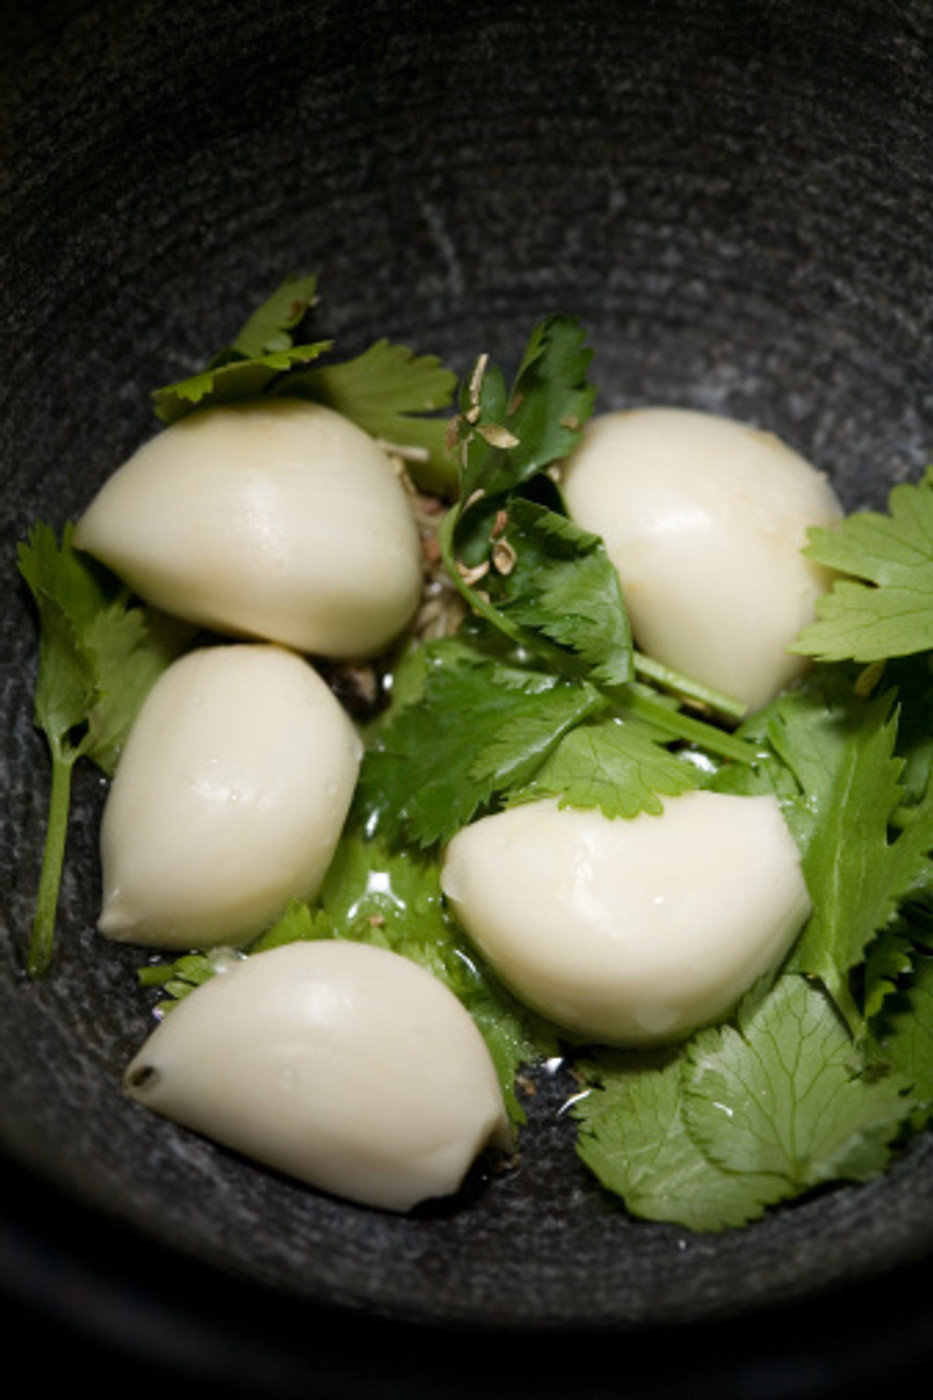 Garlic Cilantro Balsamic